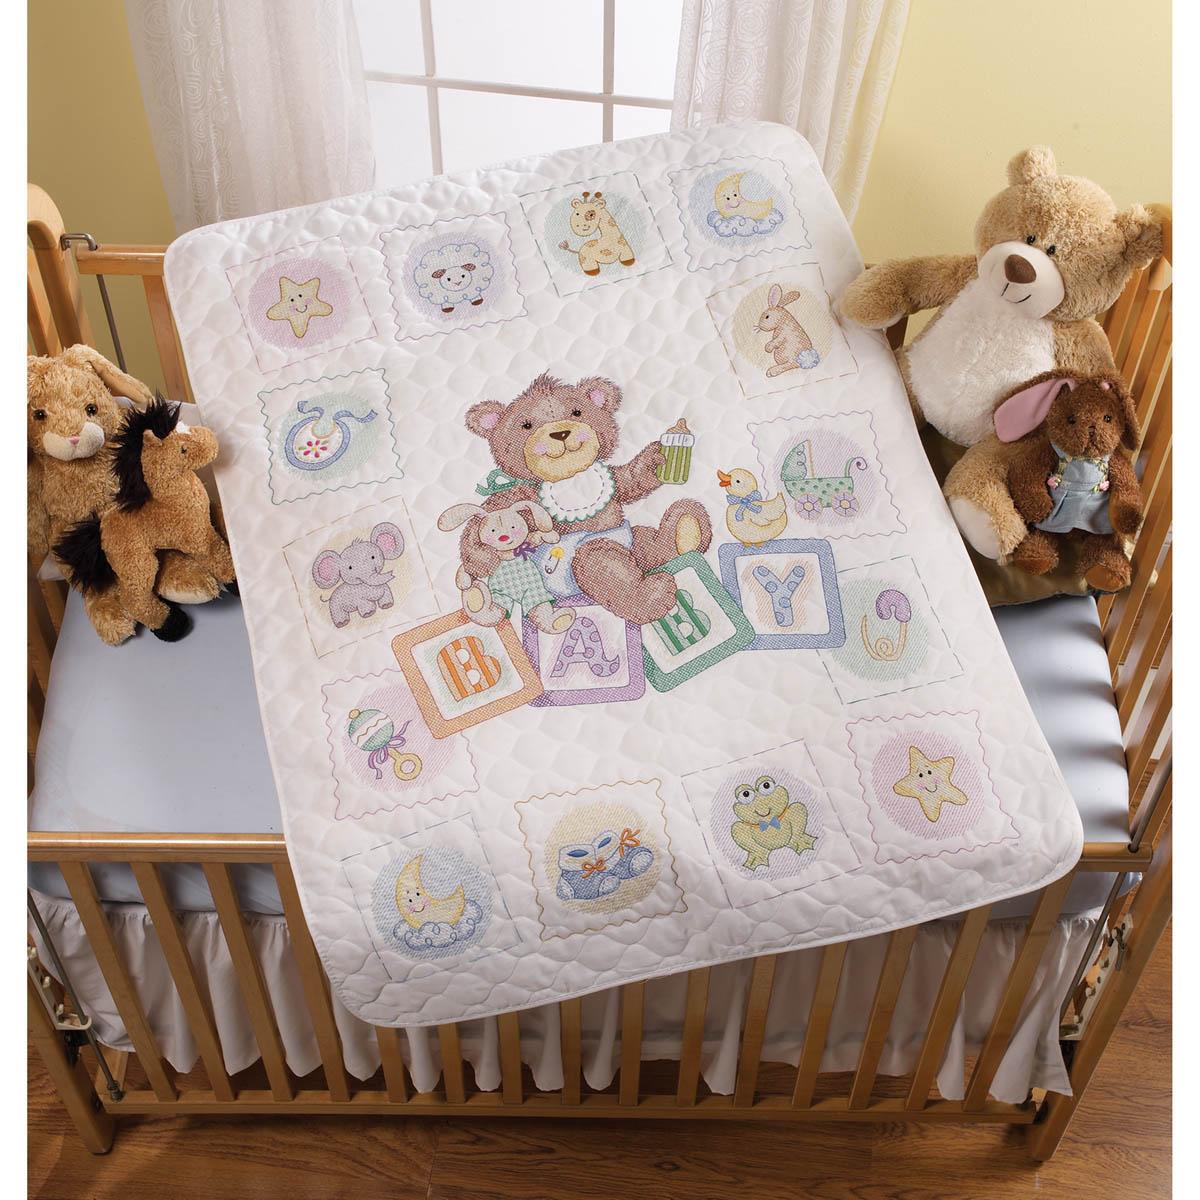 Bucilla ® Baby - Stamped Cross Stitch - Crib Ensembles - Baby Blocks - Crib Cover